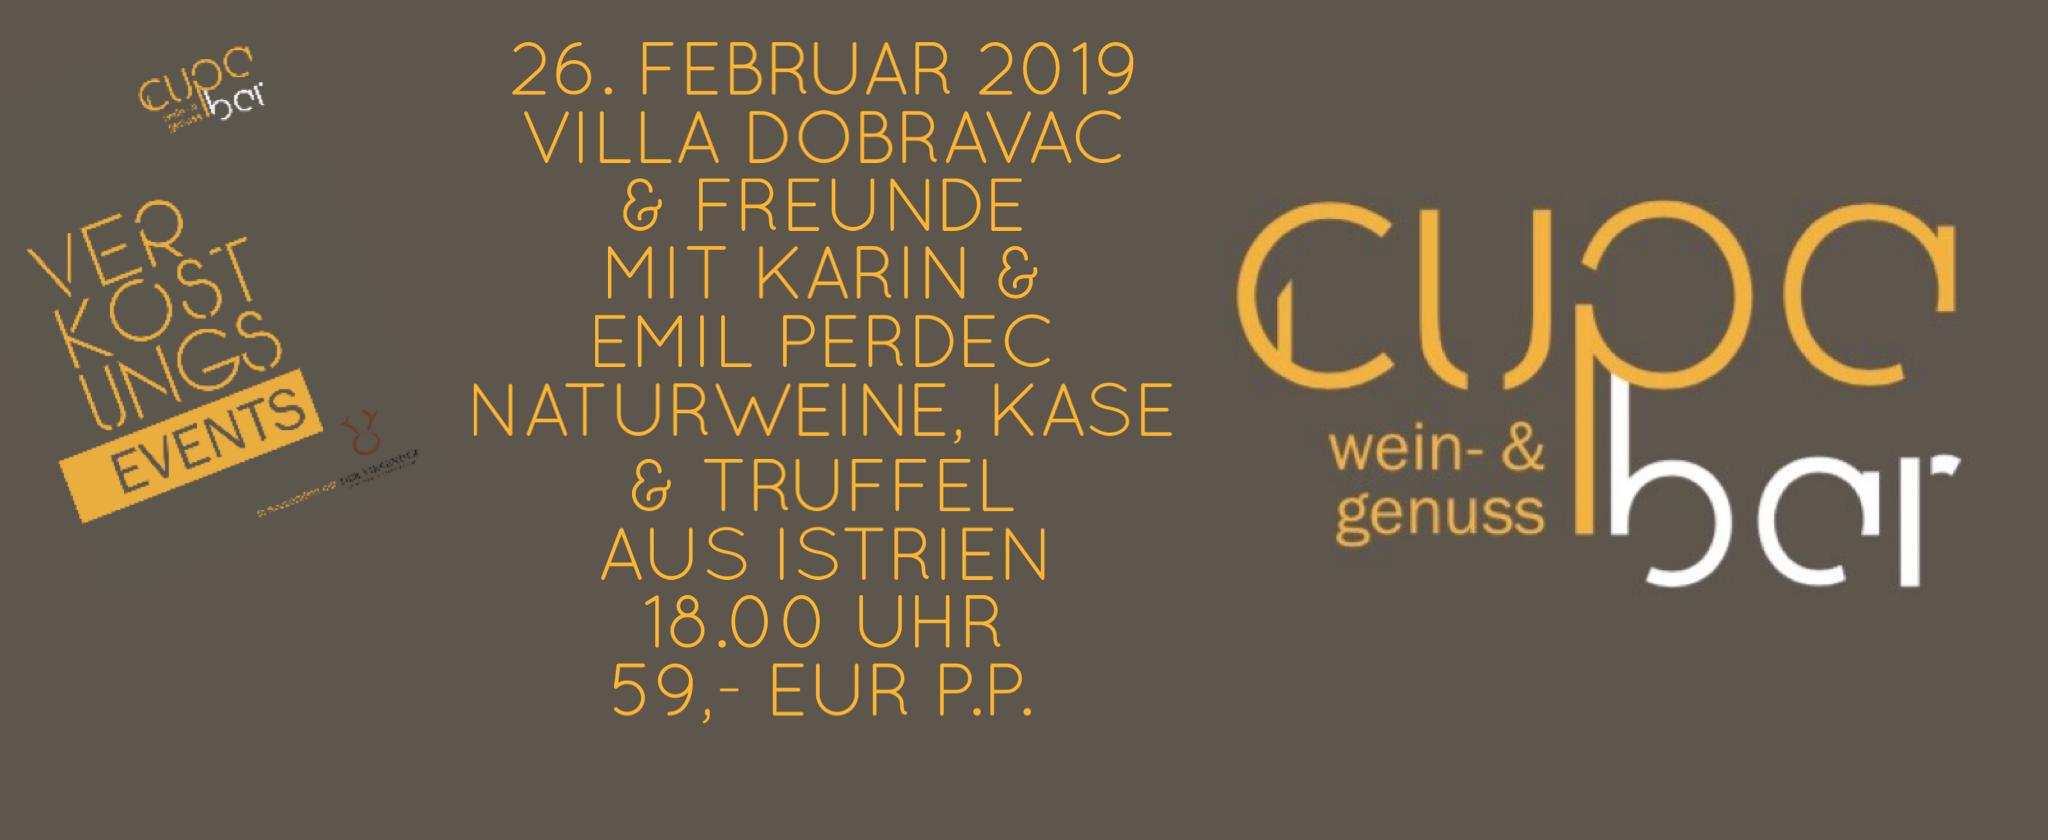 Verkostungs Events . Cupa Bar . Weine Villa Dobravac & Friends 16. Februar 2019